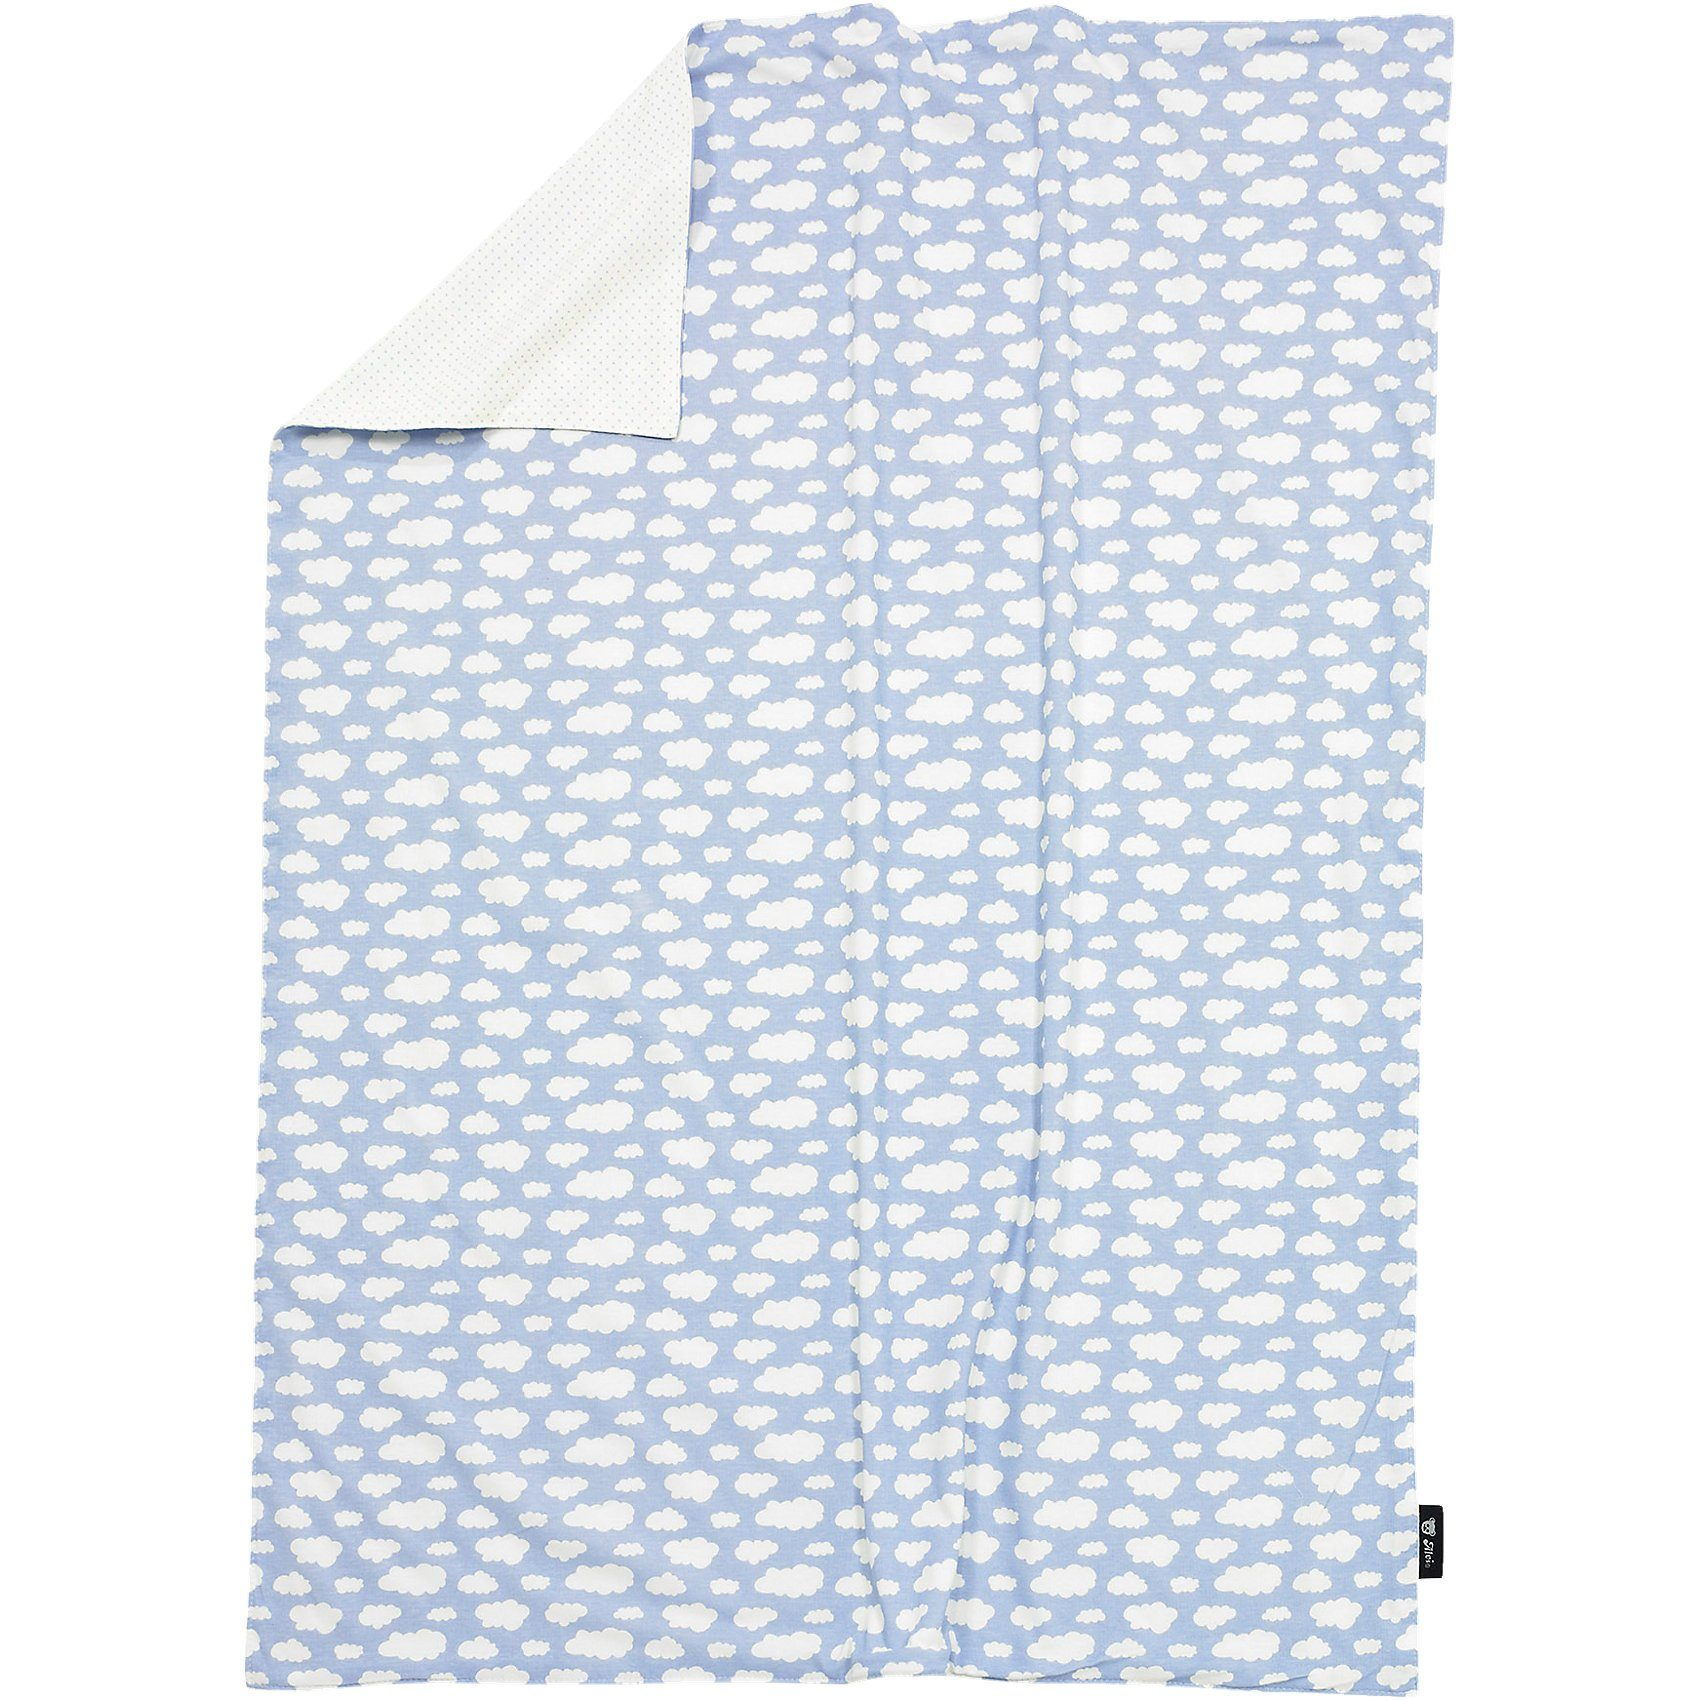 Alvi Babydecke, Jersey, Wolke, blau, 75 x 100 cm